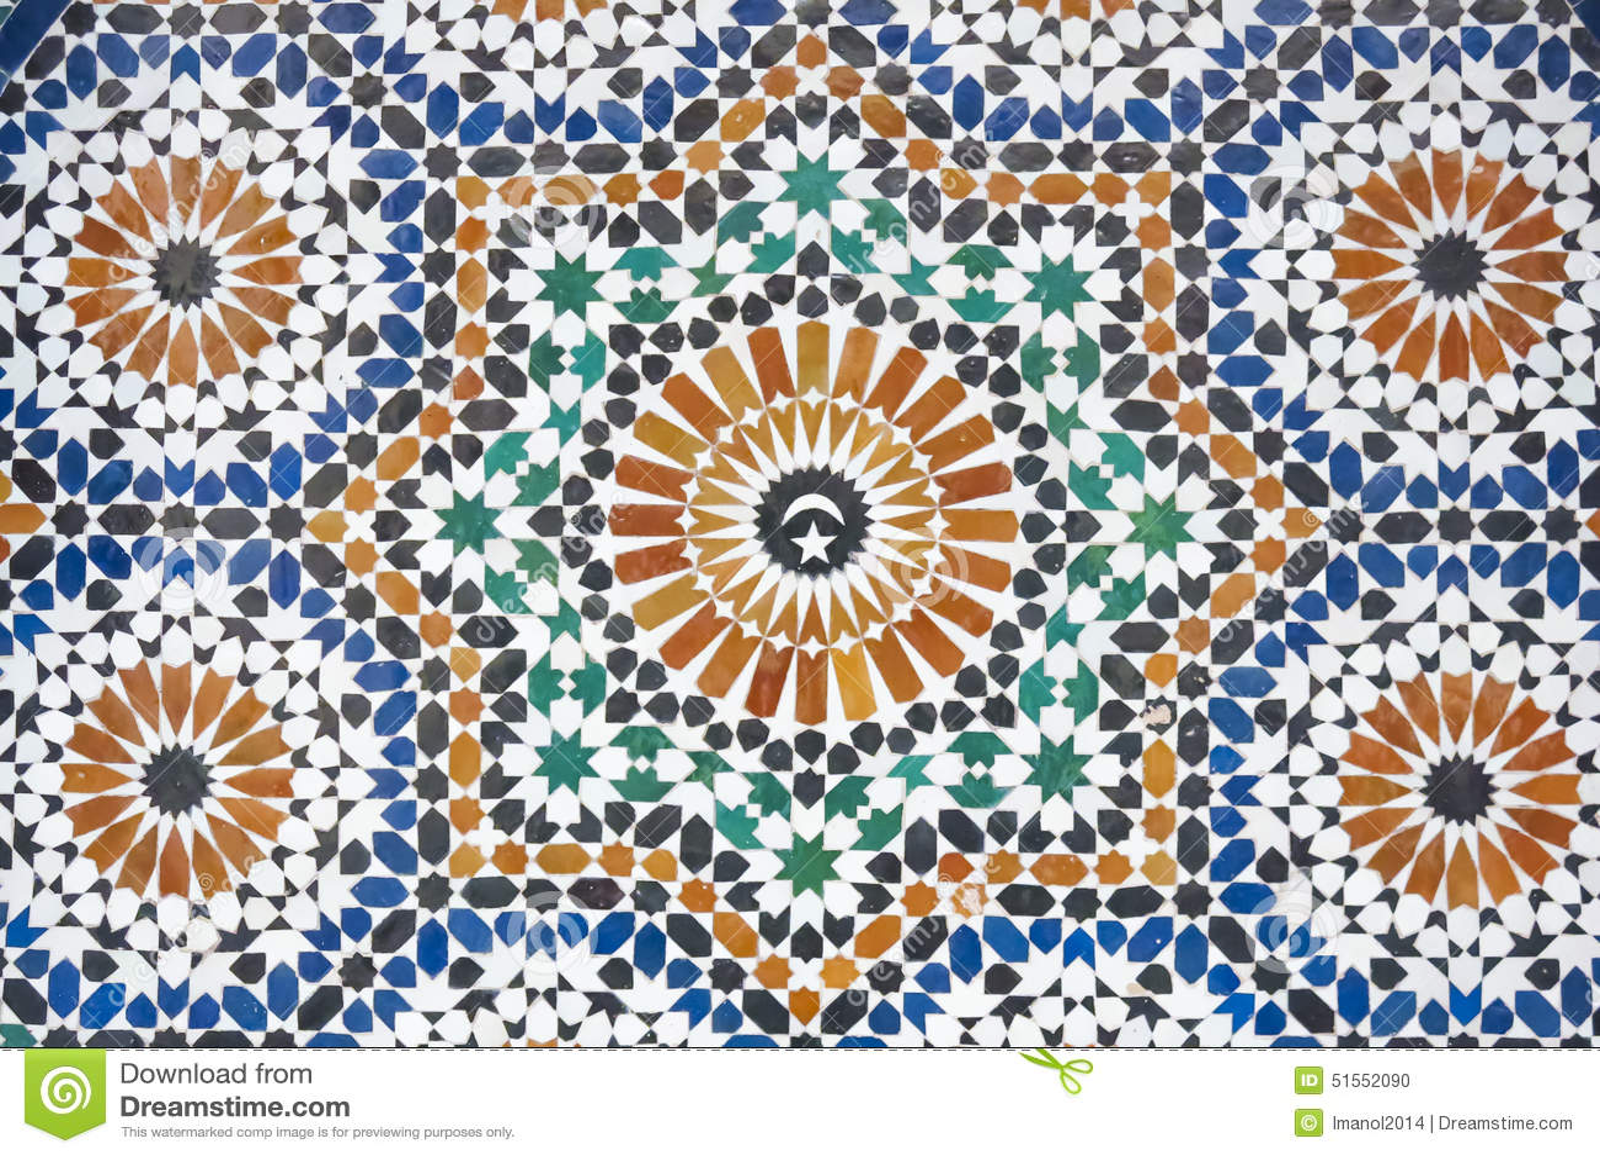 Verbazingwekkend Marokkaanse Mozaïek Betegelde Decoratie Stock Foto - Afbeelding WP-62